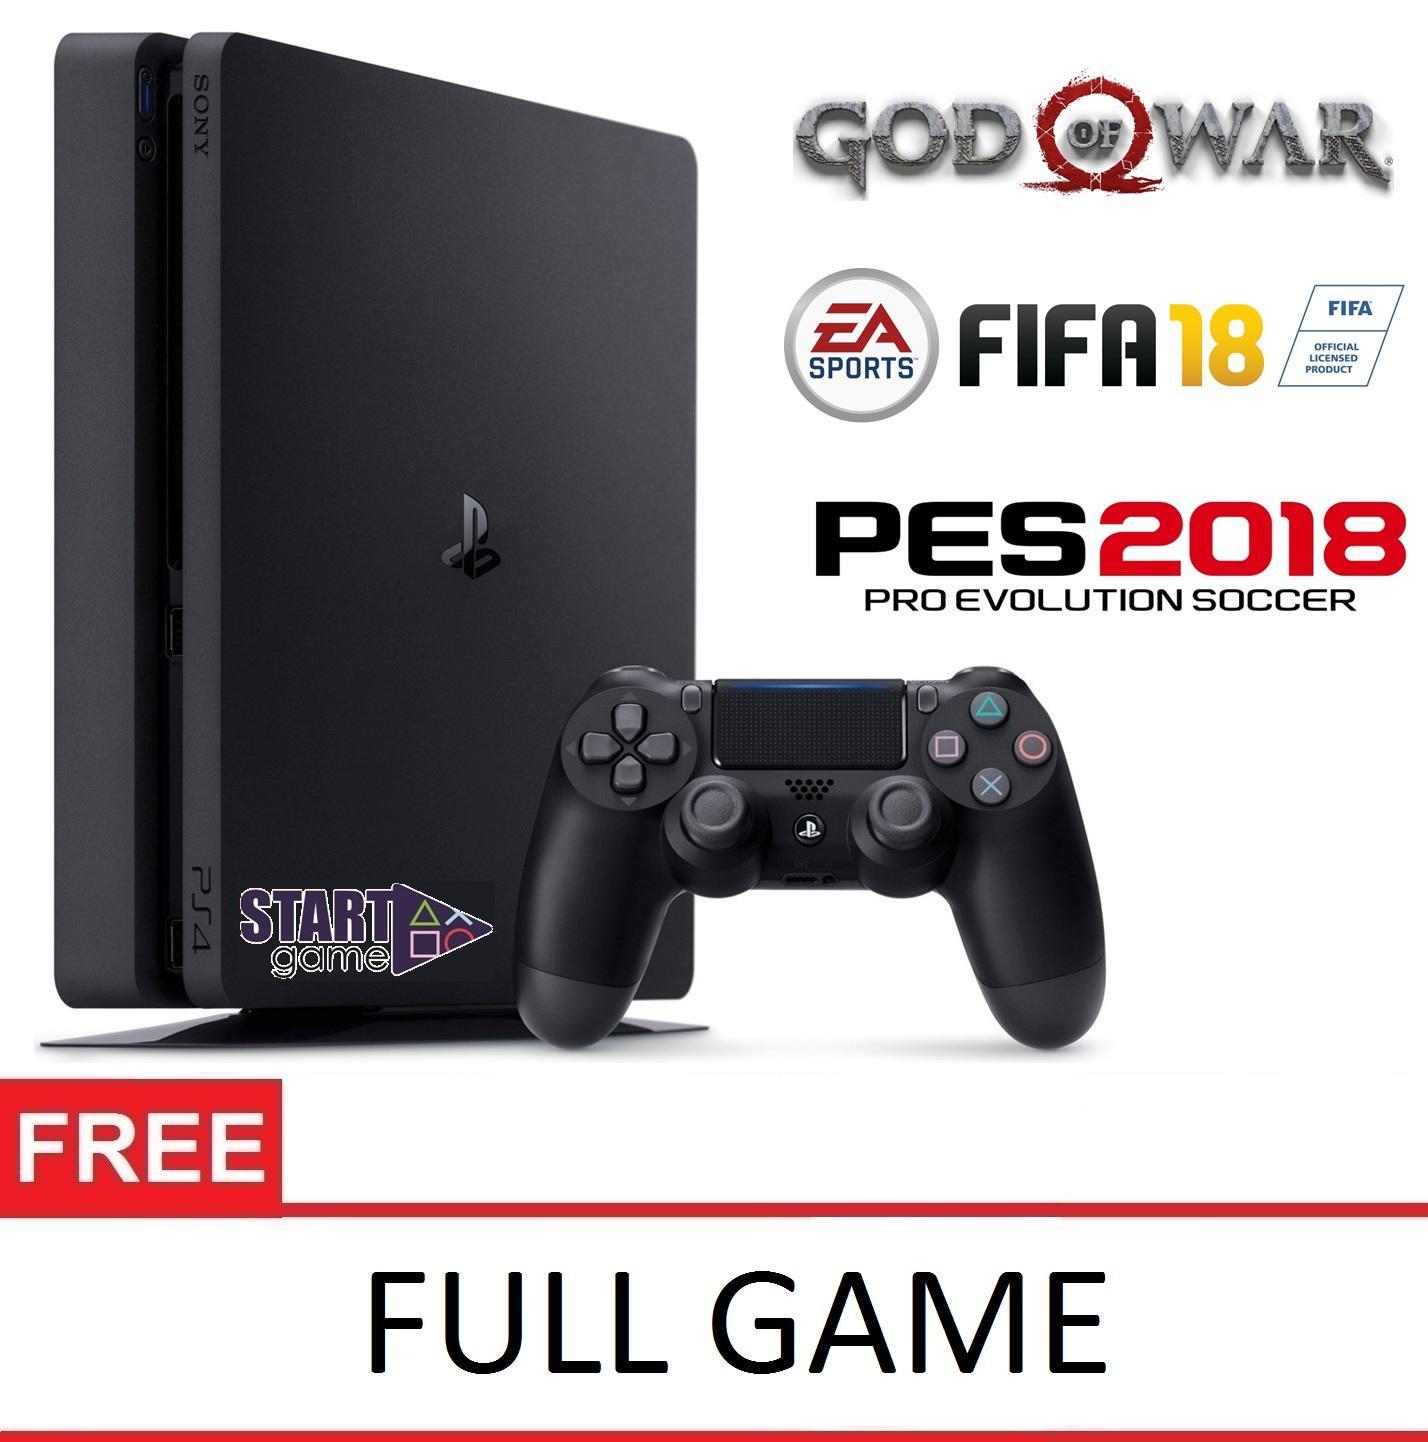 Fitur Sony Playstation 4 Garansi Cuh 1206a B01 Hitam The Slim 500gb 2006a Full Game